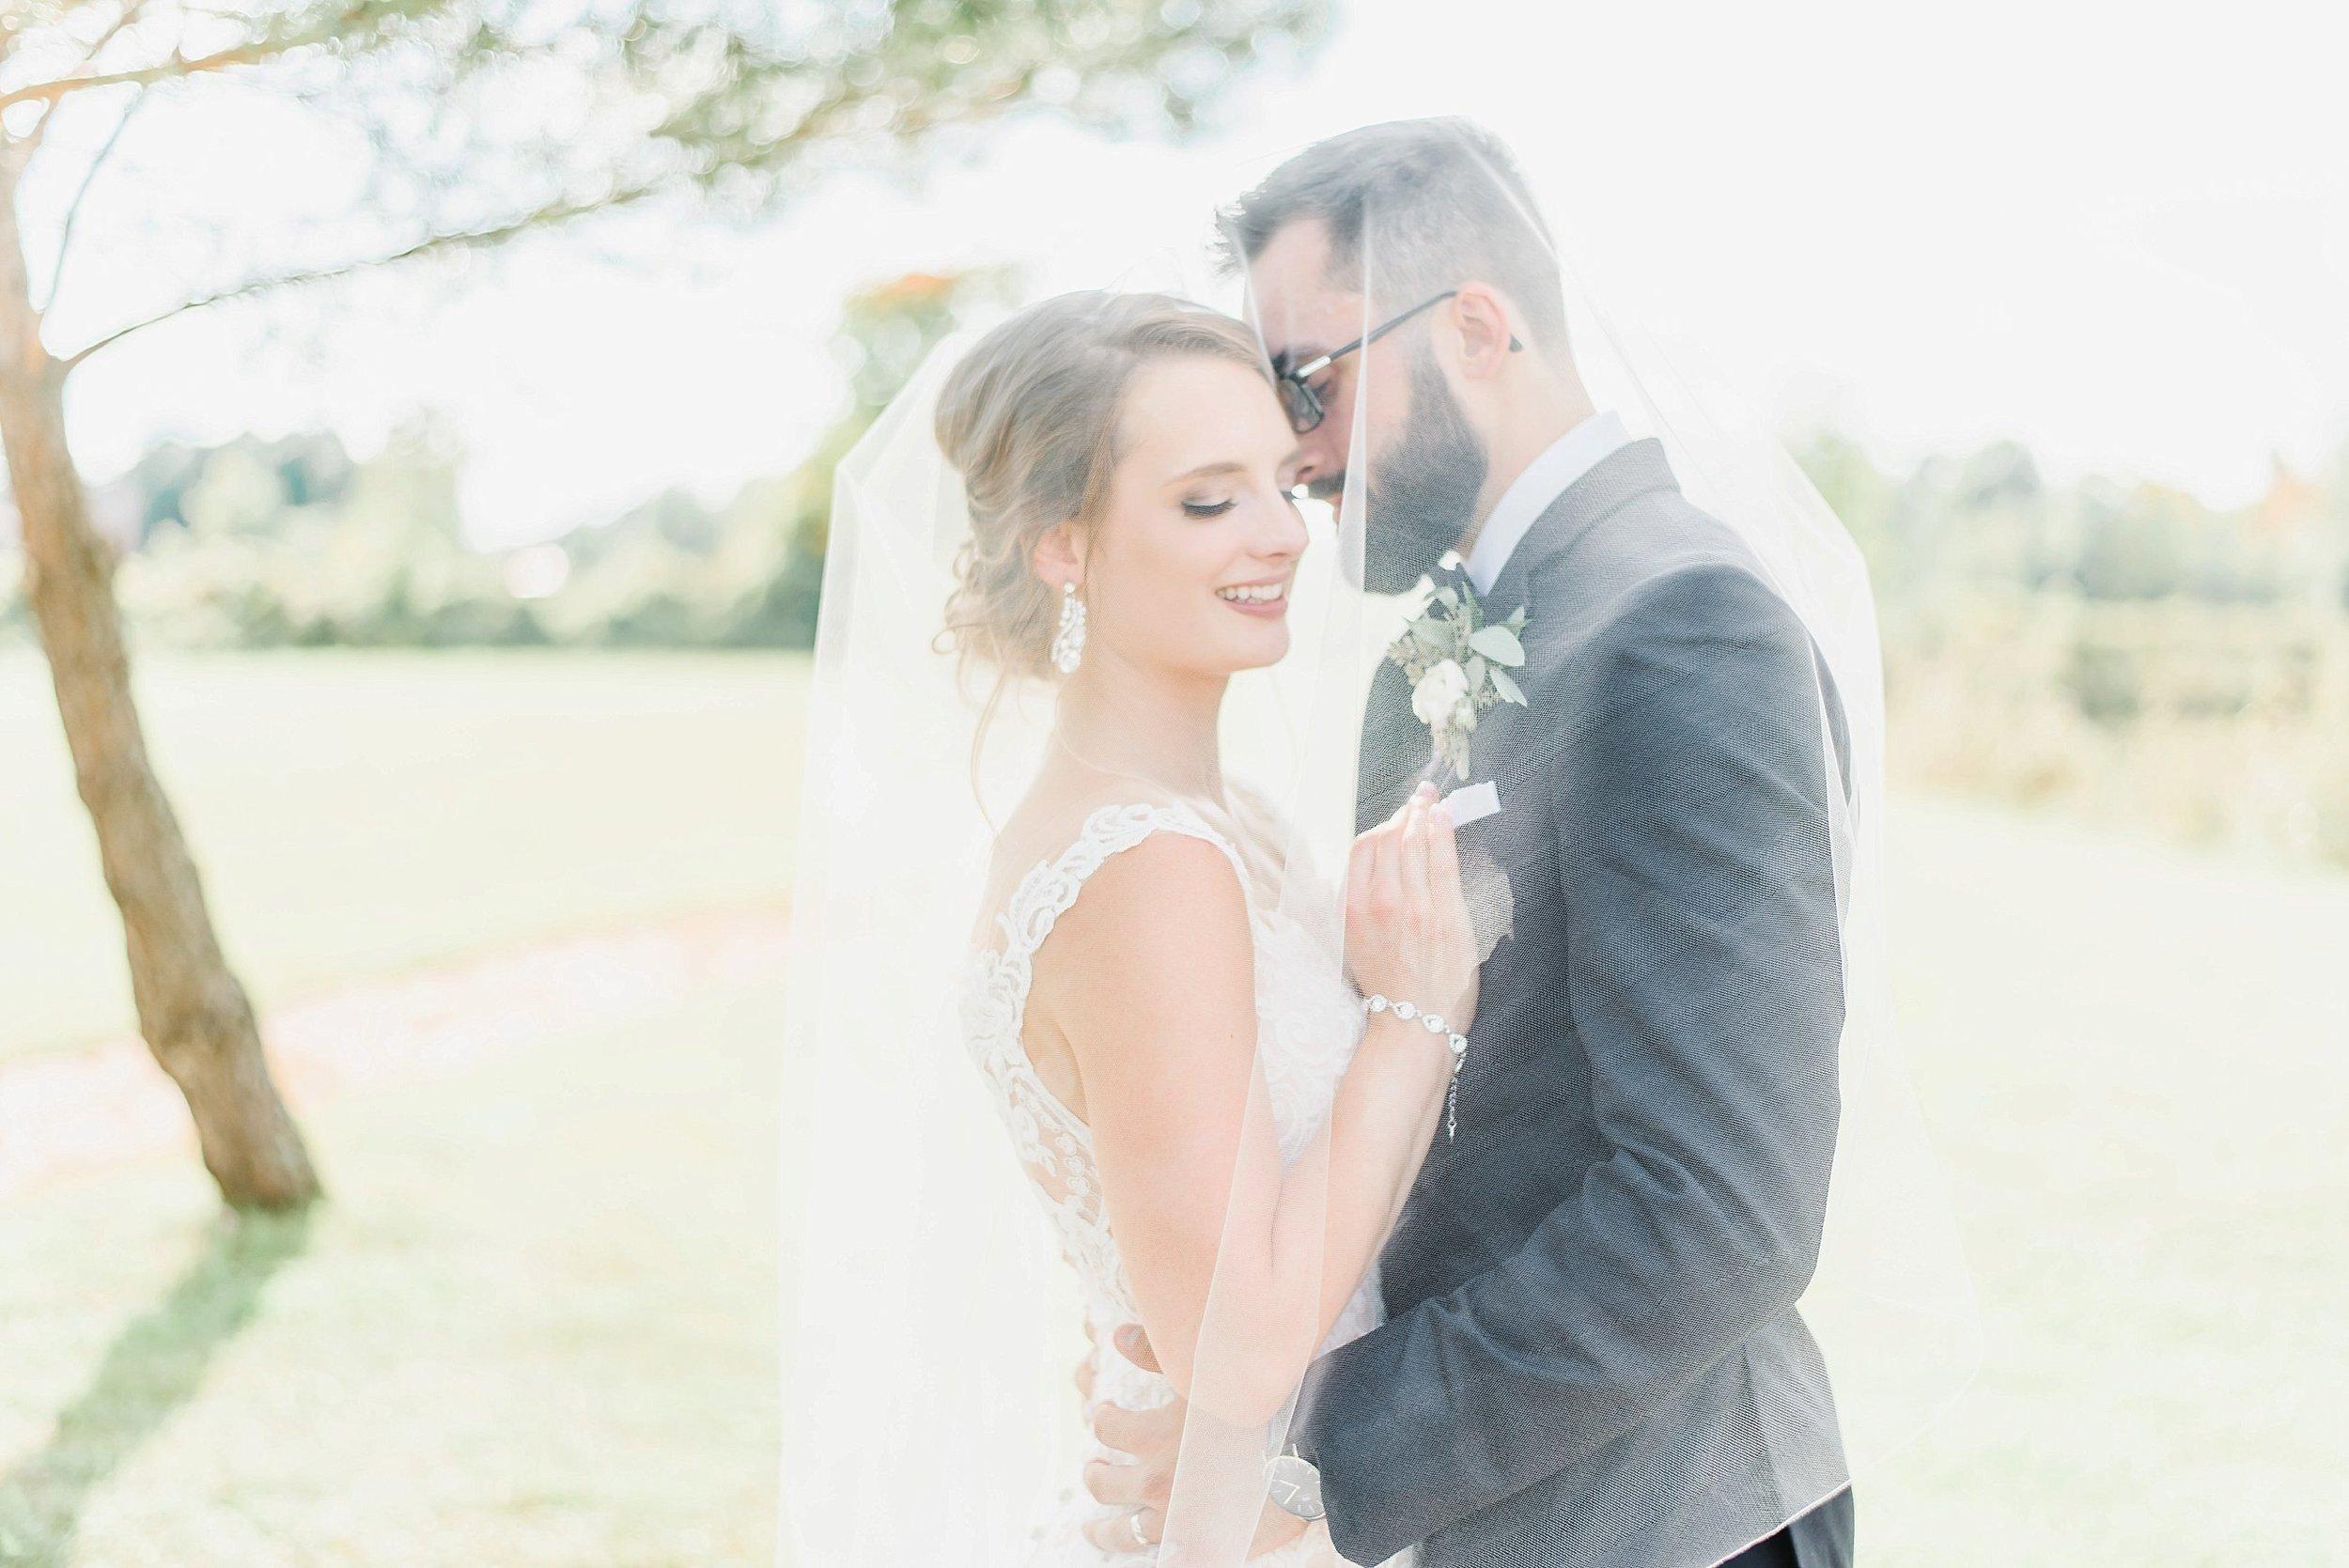 light airy indie fine art ottawa wedding photographer | Ali and Batoul Photography_1311.jpg